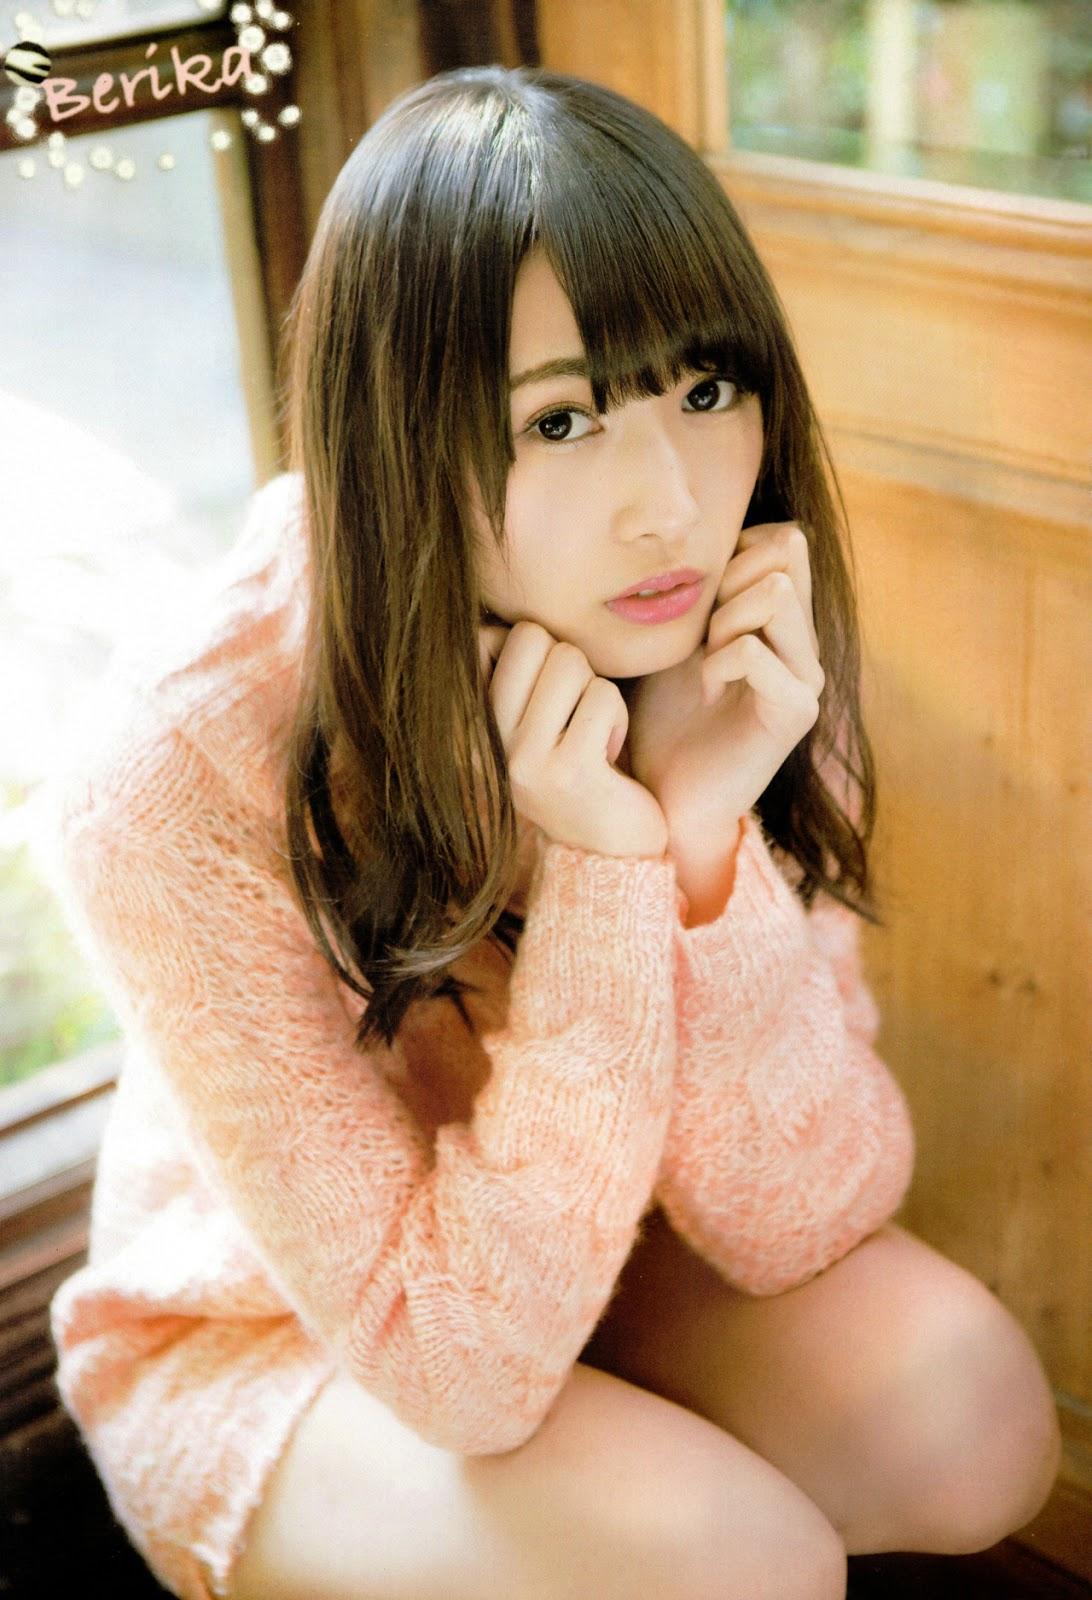 Watanabe Rika 渡辺梨加 Keyakizaka46, Shonen Champion 2017.01.12 No.05-06 (週刊少年チャンピオン 2017年05-06合併号)